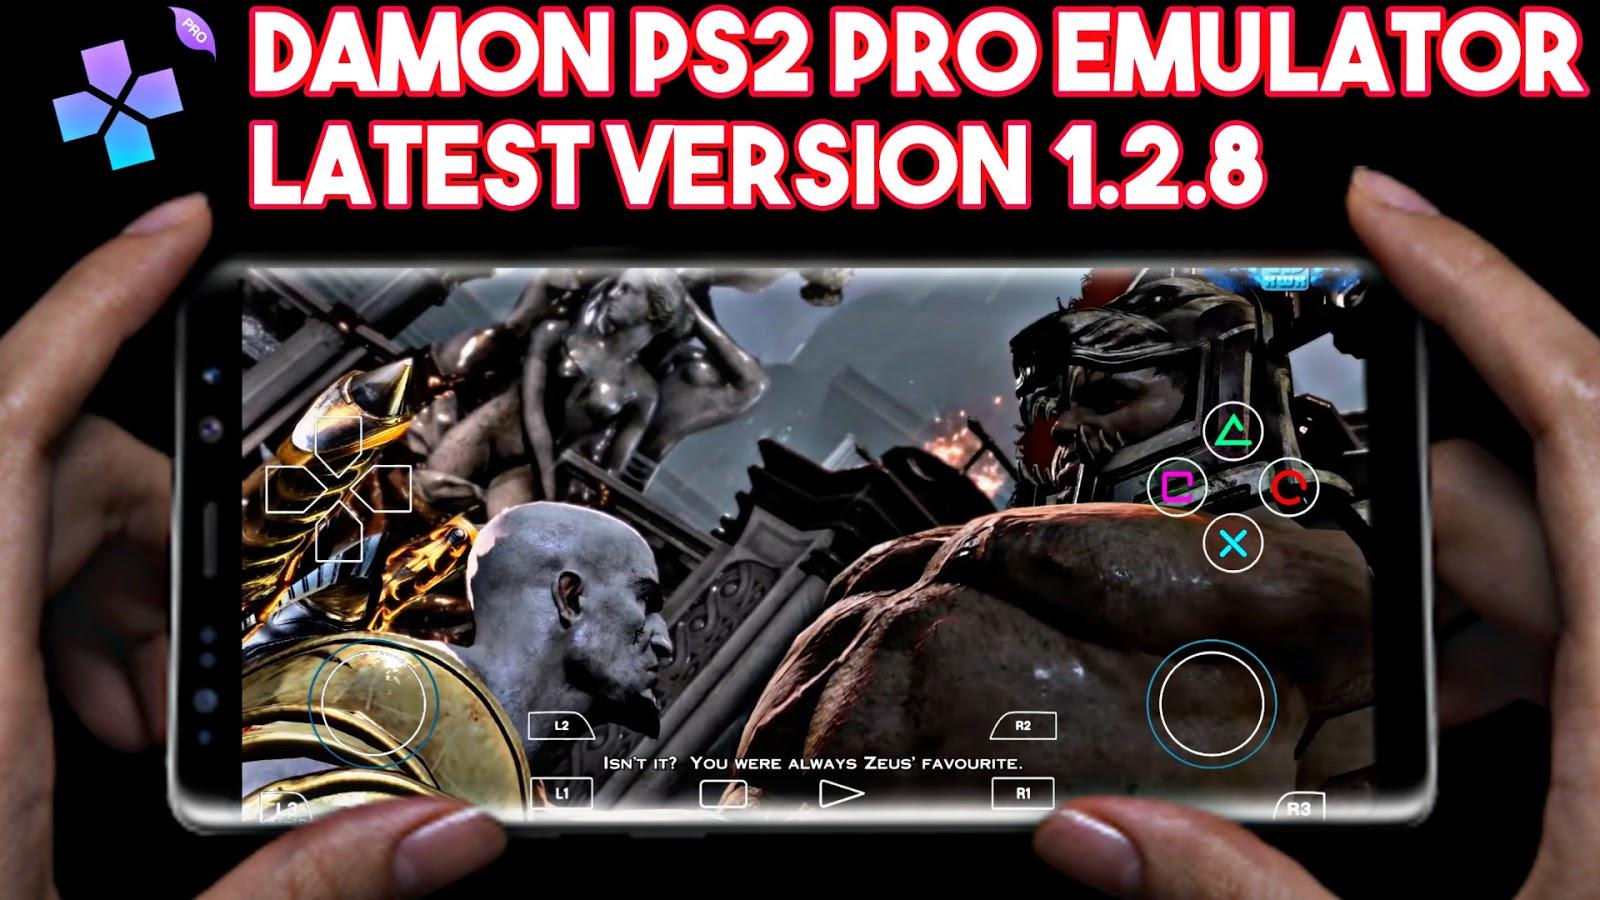 Damon ps2 pro mod apk | DamonPS2 PRO (PS2 Emulator) 1 2 8 [Paid] apk